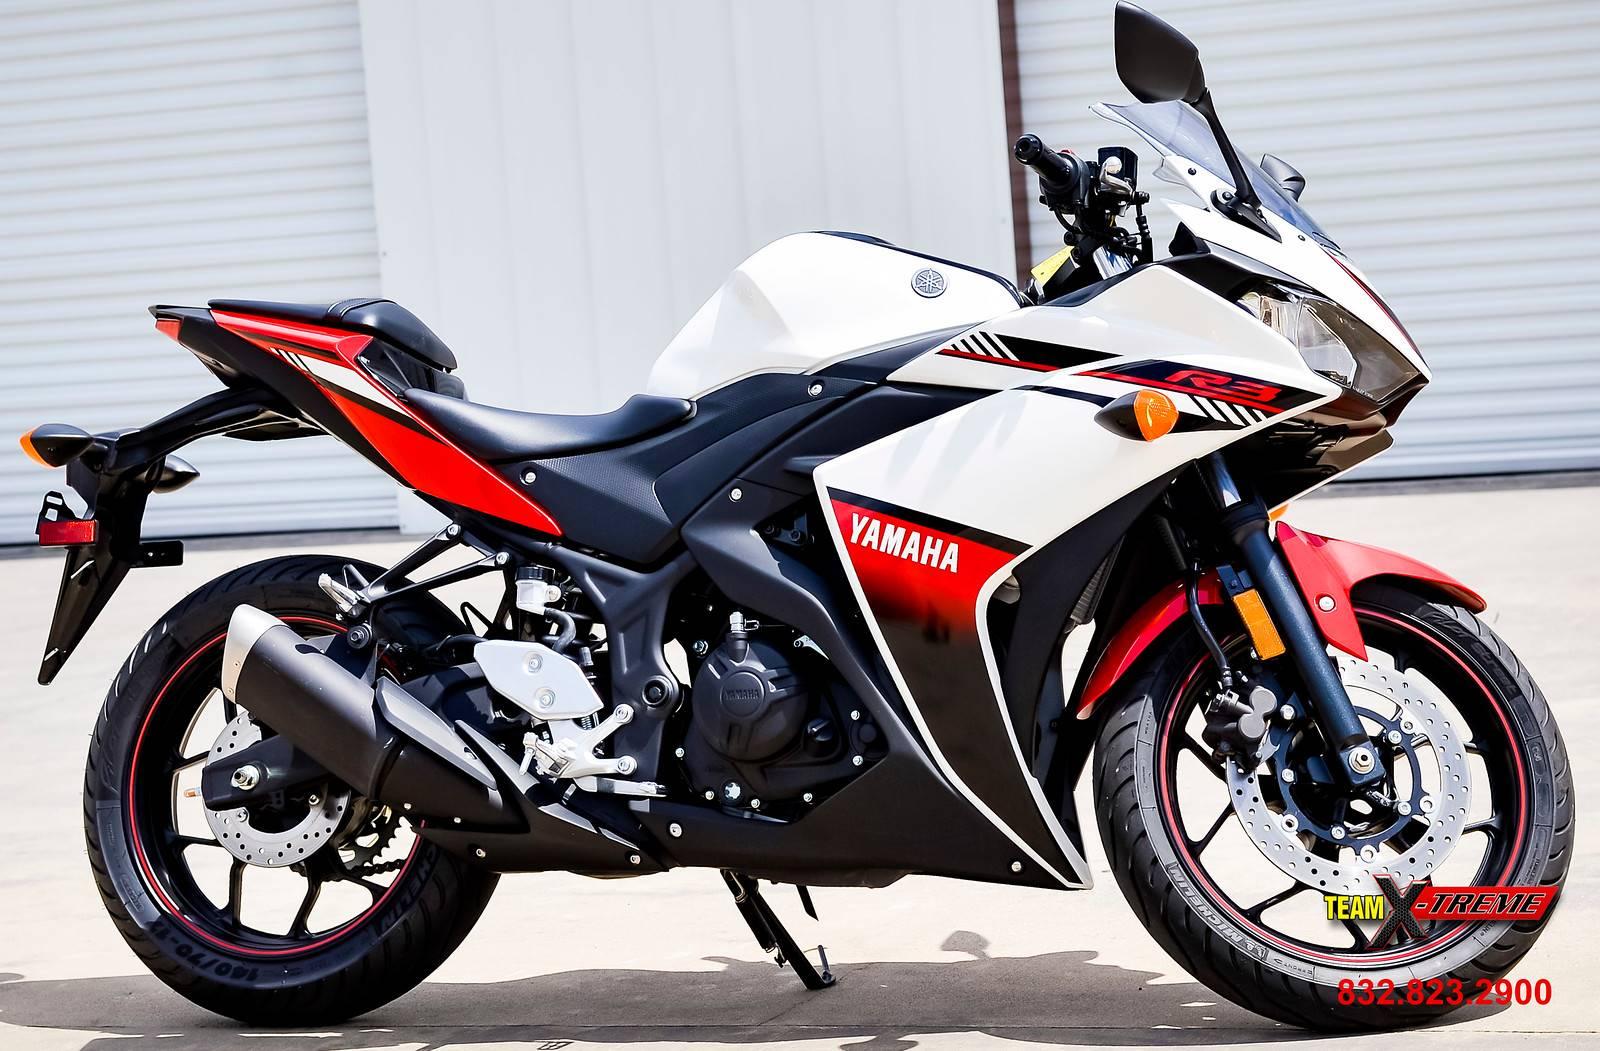 2016 Yamaha YZF-R3 for sale 77380